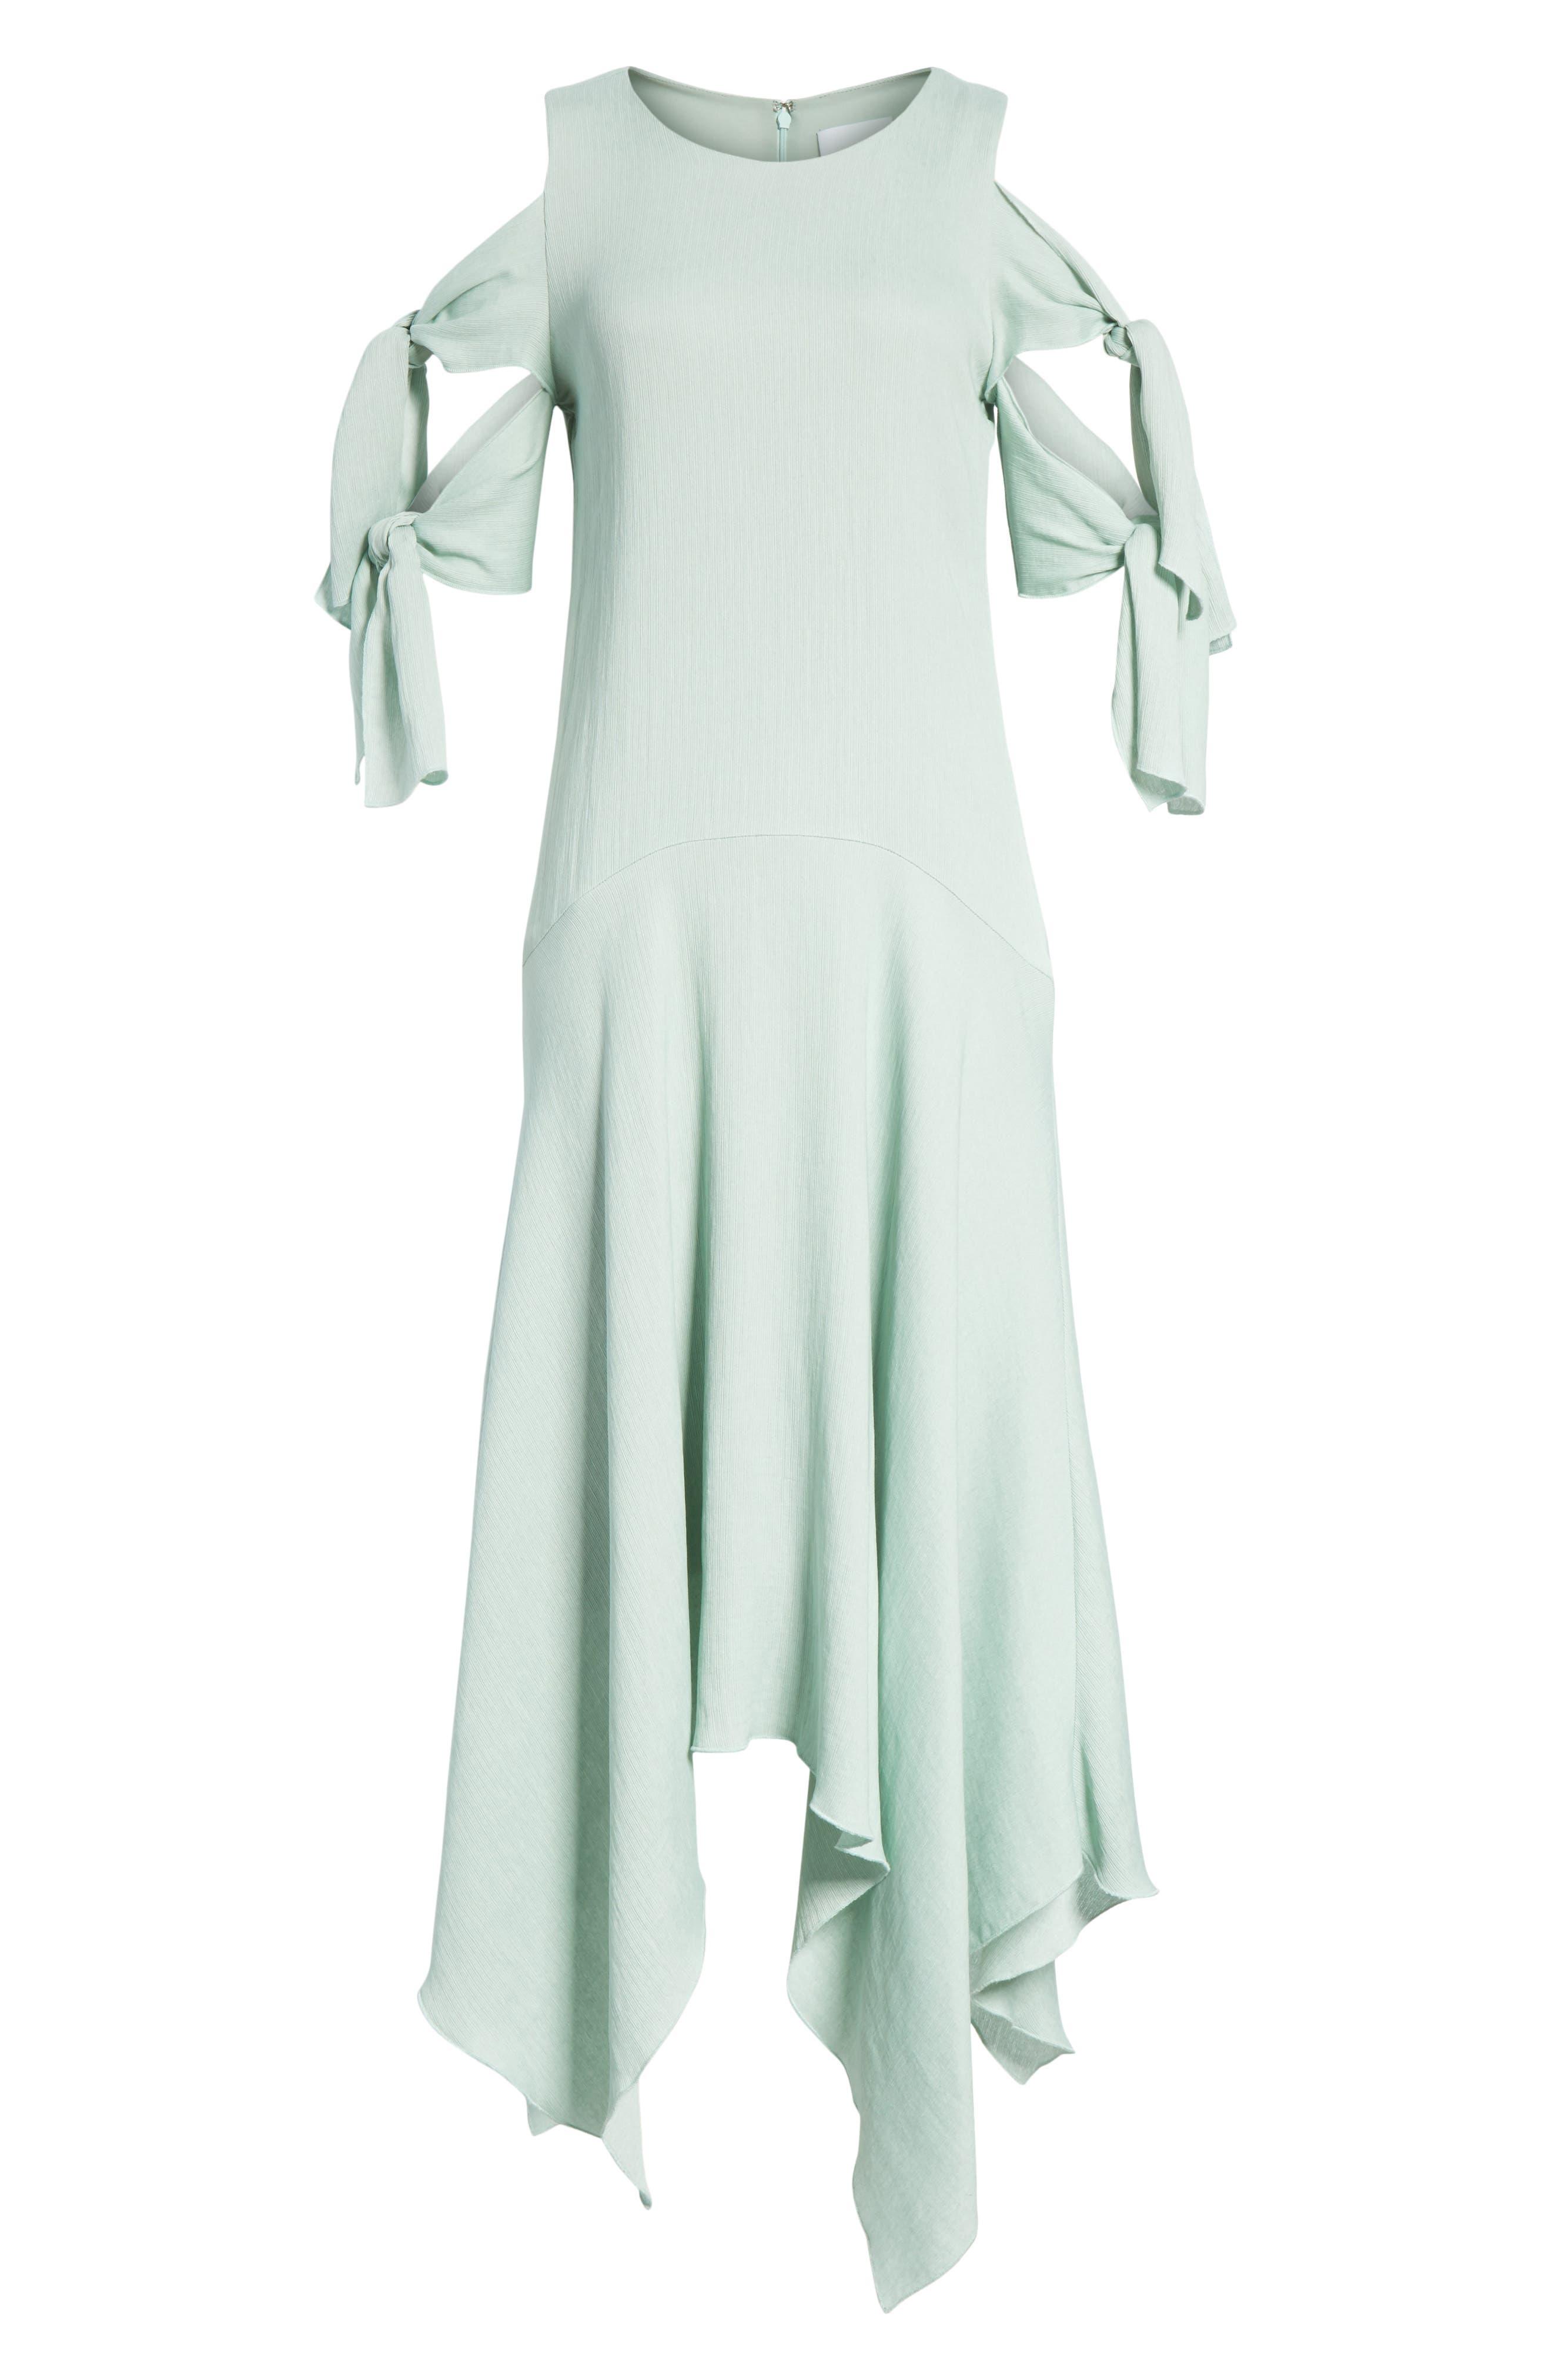 Prose & Poetry Vivianna Drop Waist Midi Dress,                             Alternate thumbnail 6, color,                             332